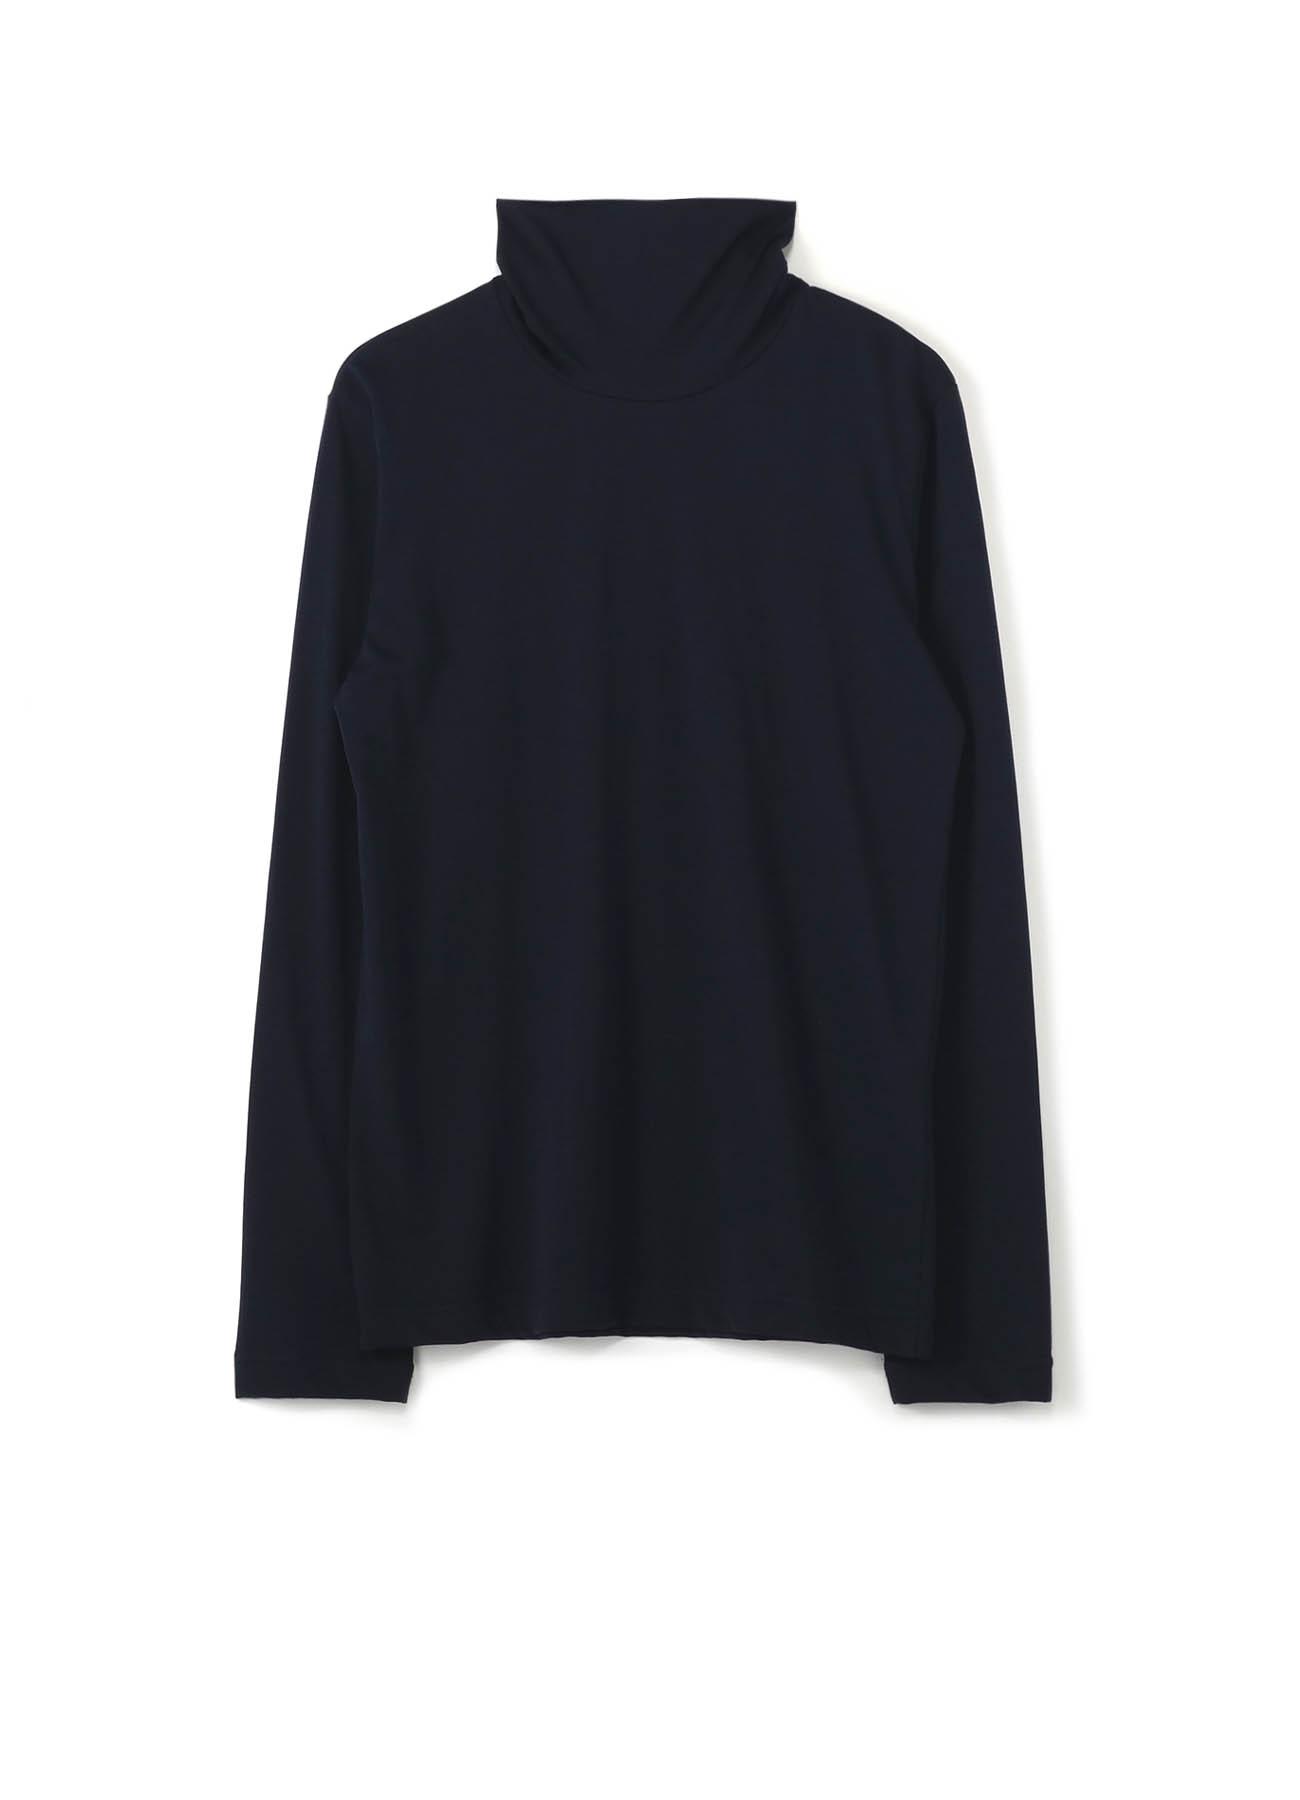 SOFT COTTON HIGHT-NECKED COLLAR LONG SLEEVE T-SHIRT